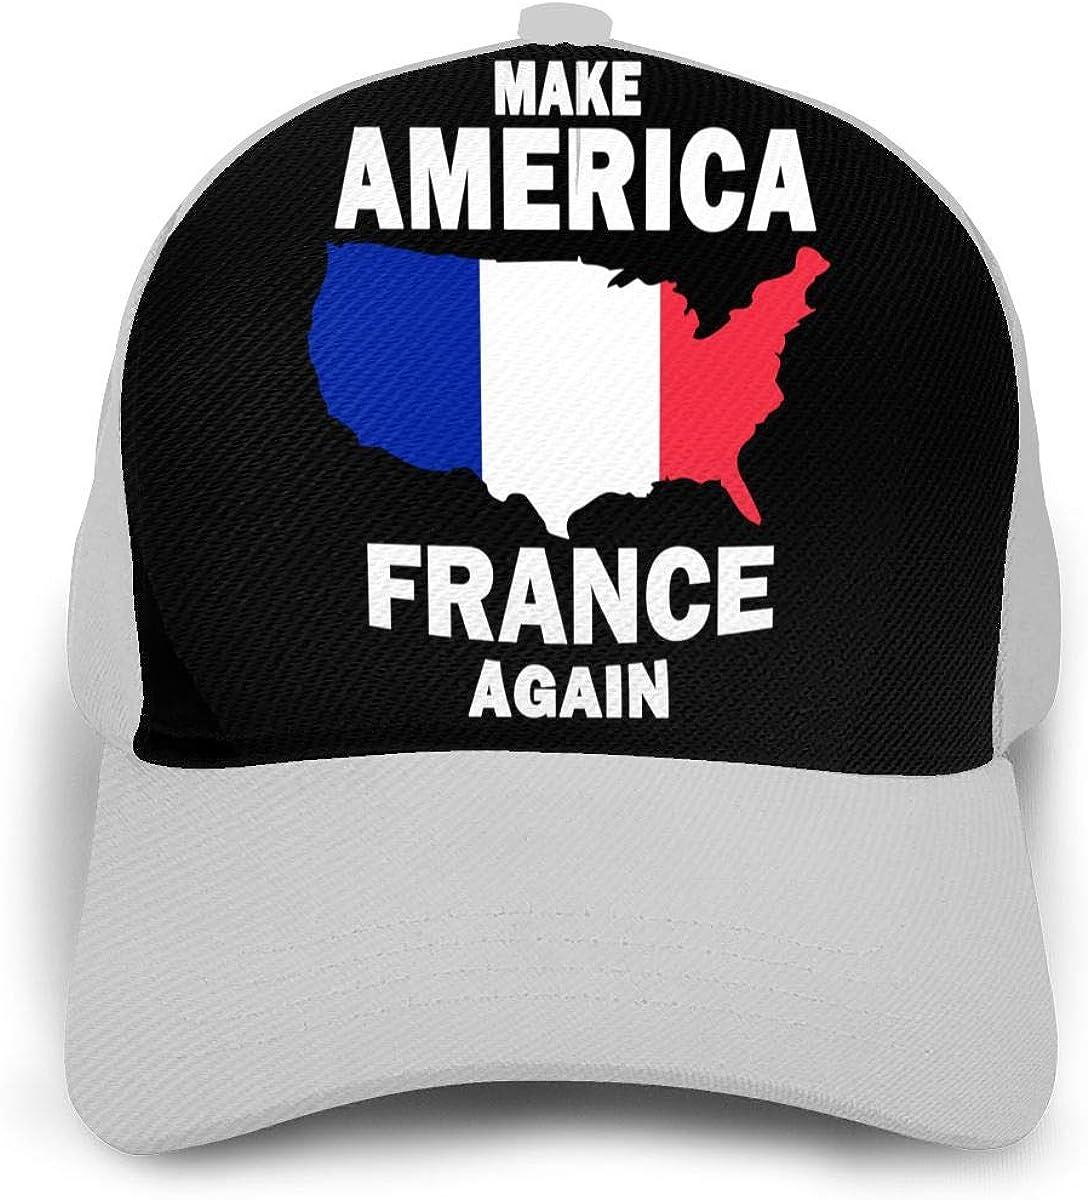 Y94OIW@MAO Make America France Again Trucker Hat for Unisex Cotton Sports Cap